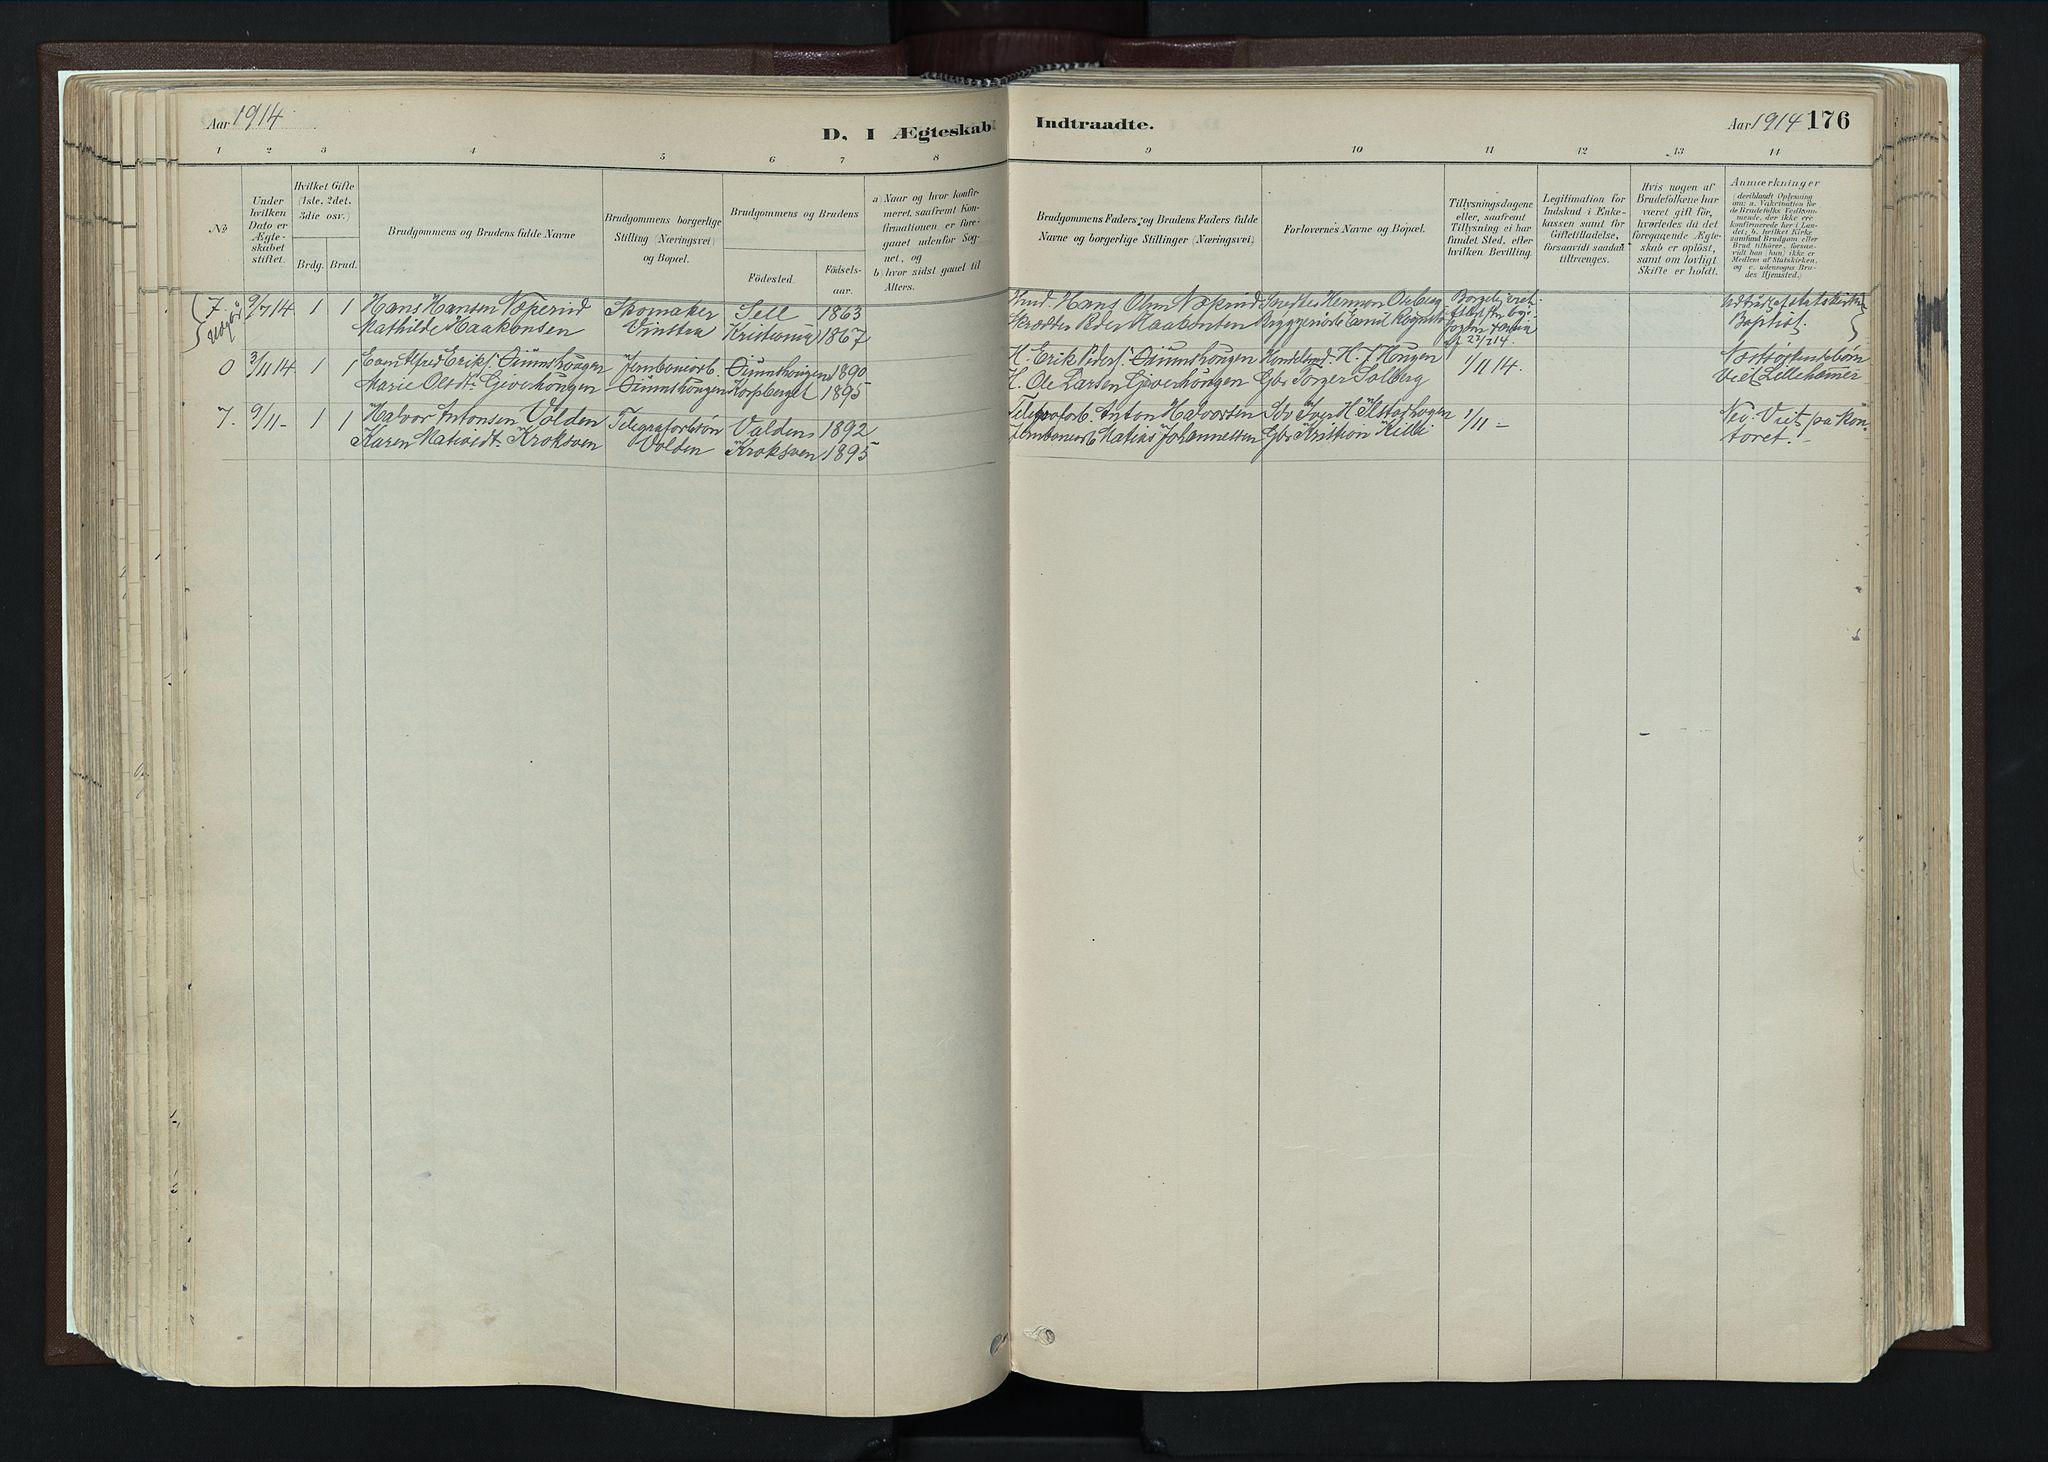 SAH, Nord-Fron prestekontor, Ministerialbok nr. 4, 1884-1914, s. 176